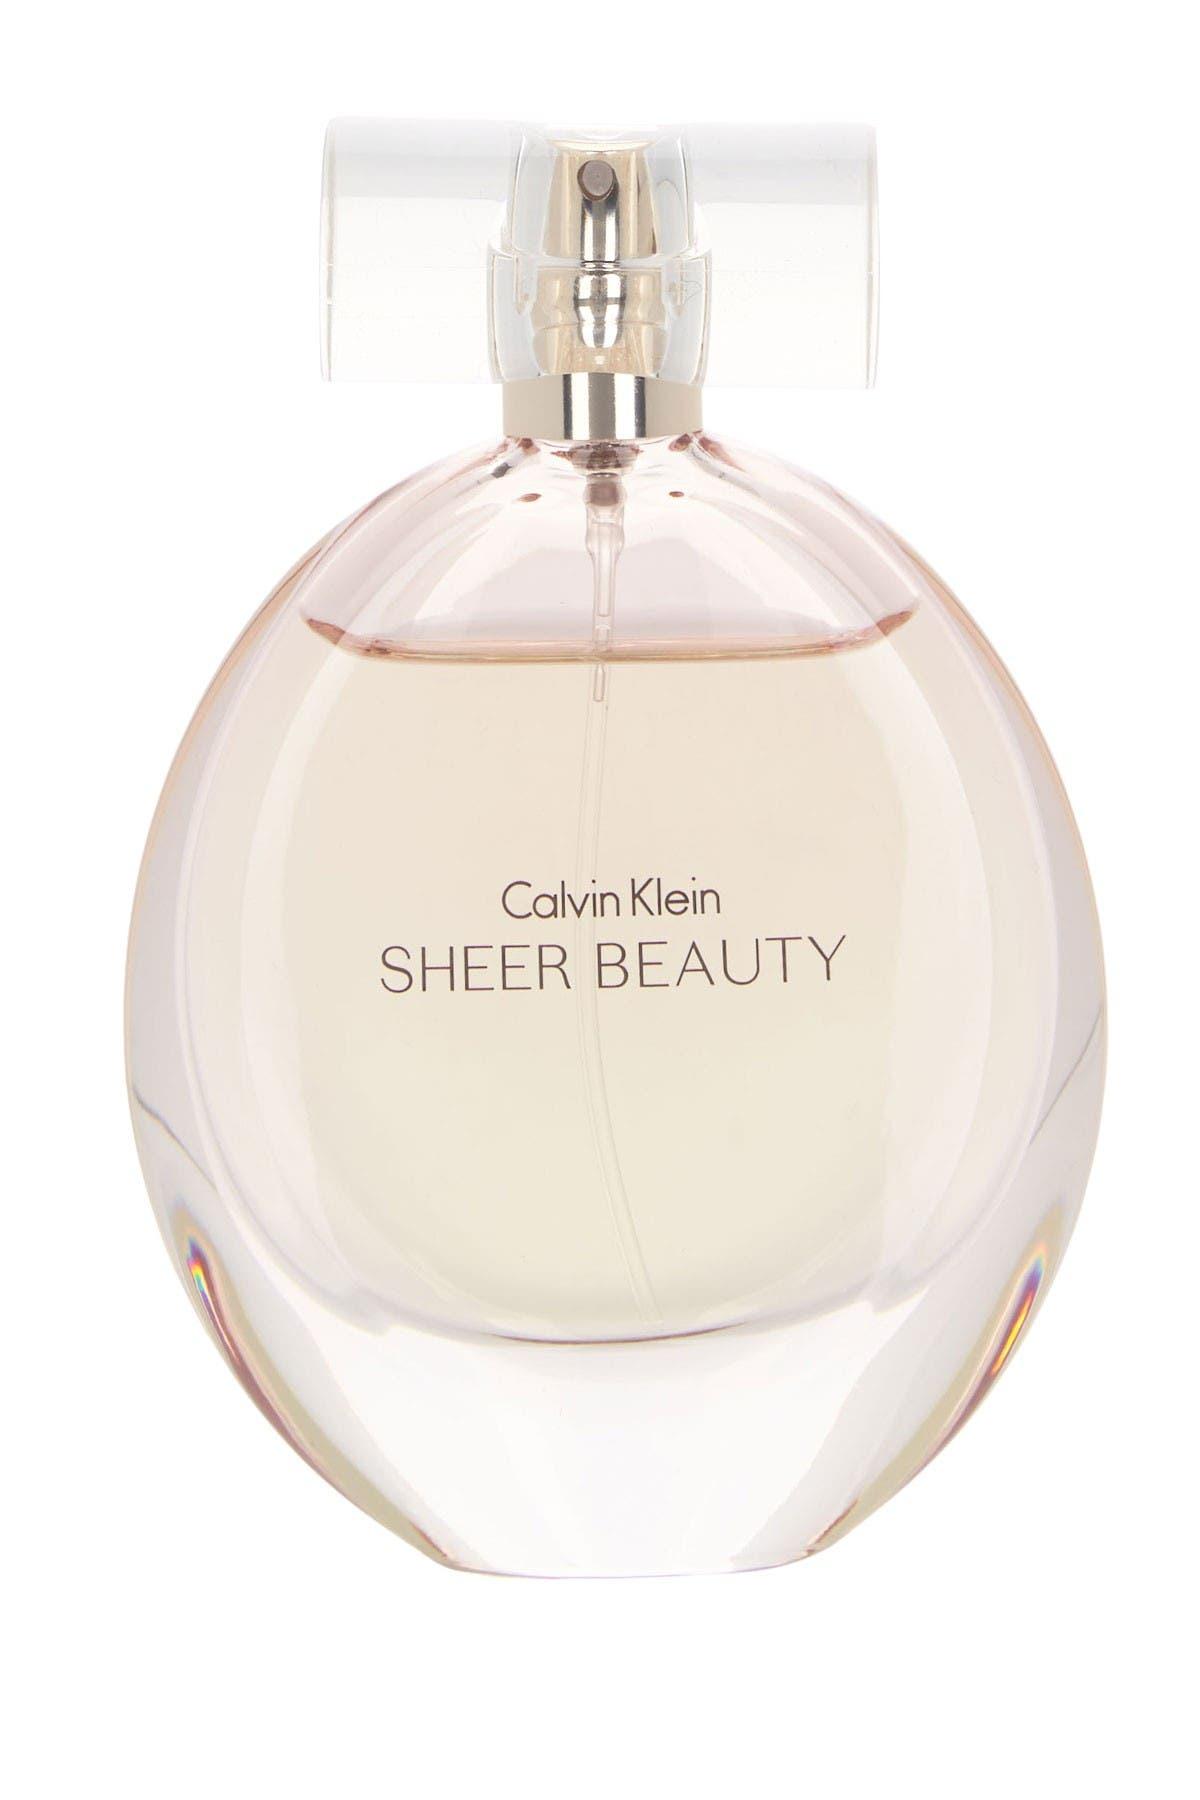 Image of Calvin Klein Sheer Beauty Eau De Toilette - 50 ml.